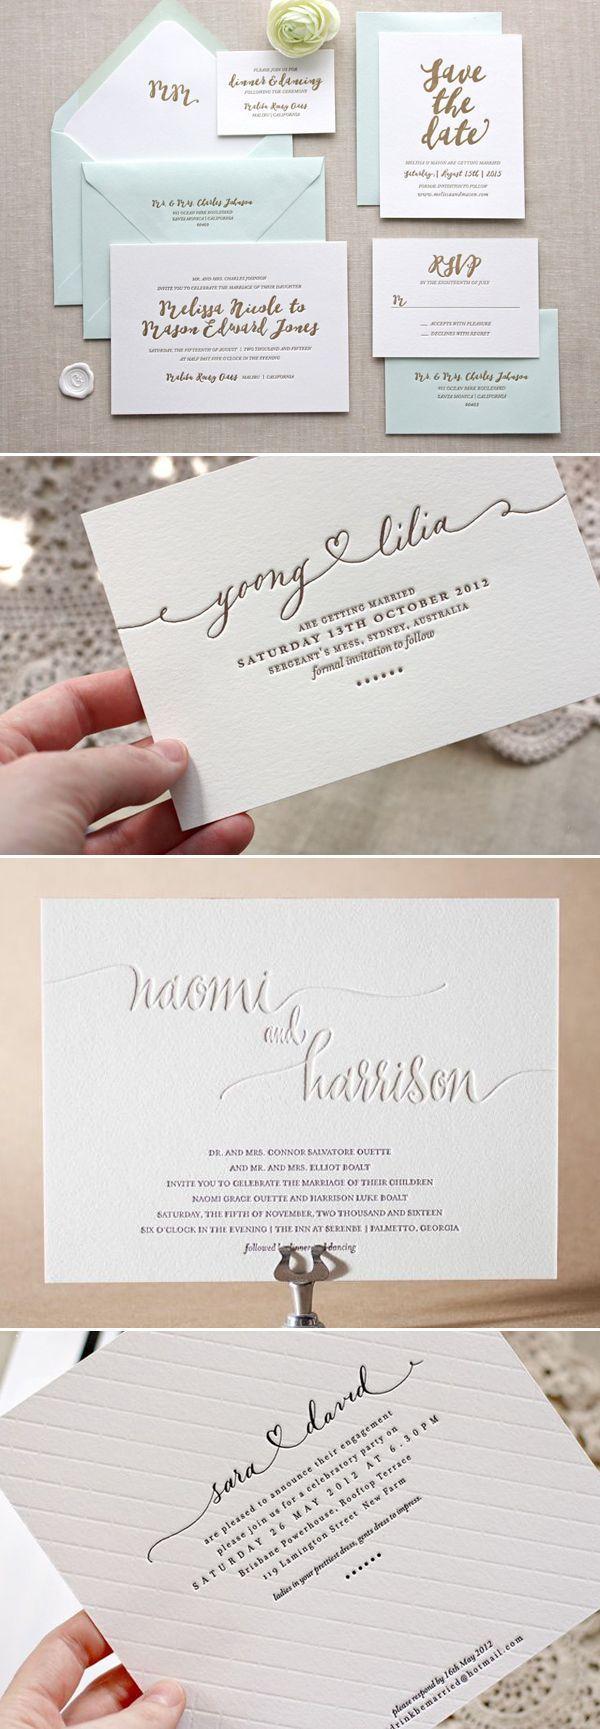 creative wedding invitations photo wedding invitations 30 Creative Invitation Ideas for Minimalist Couples